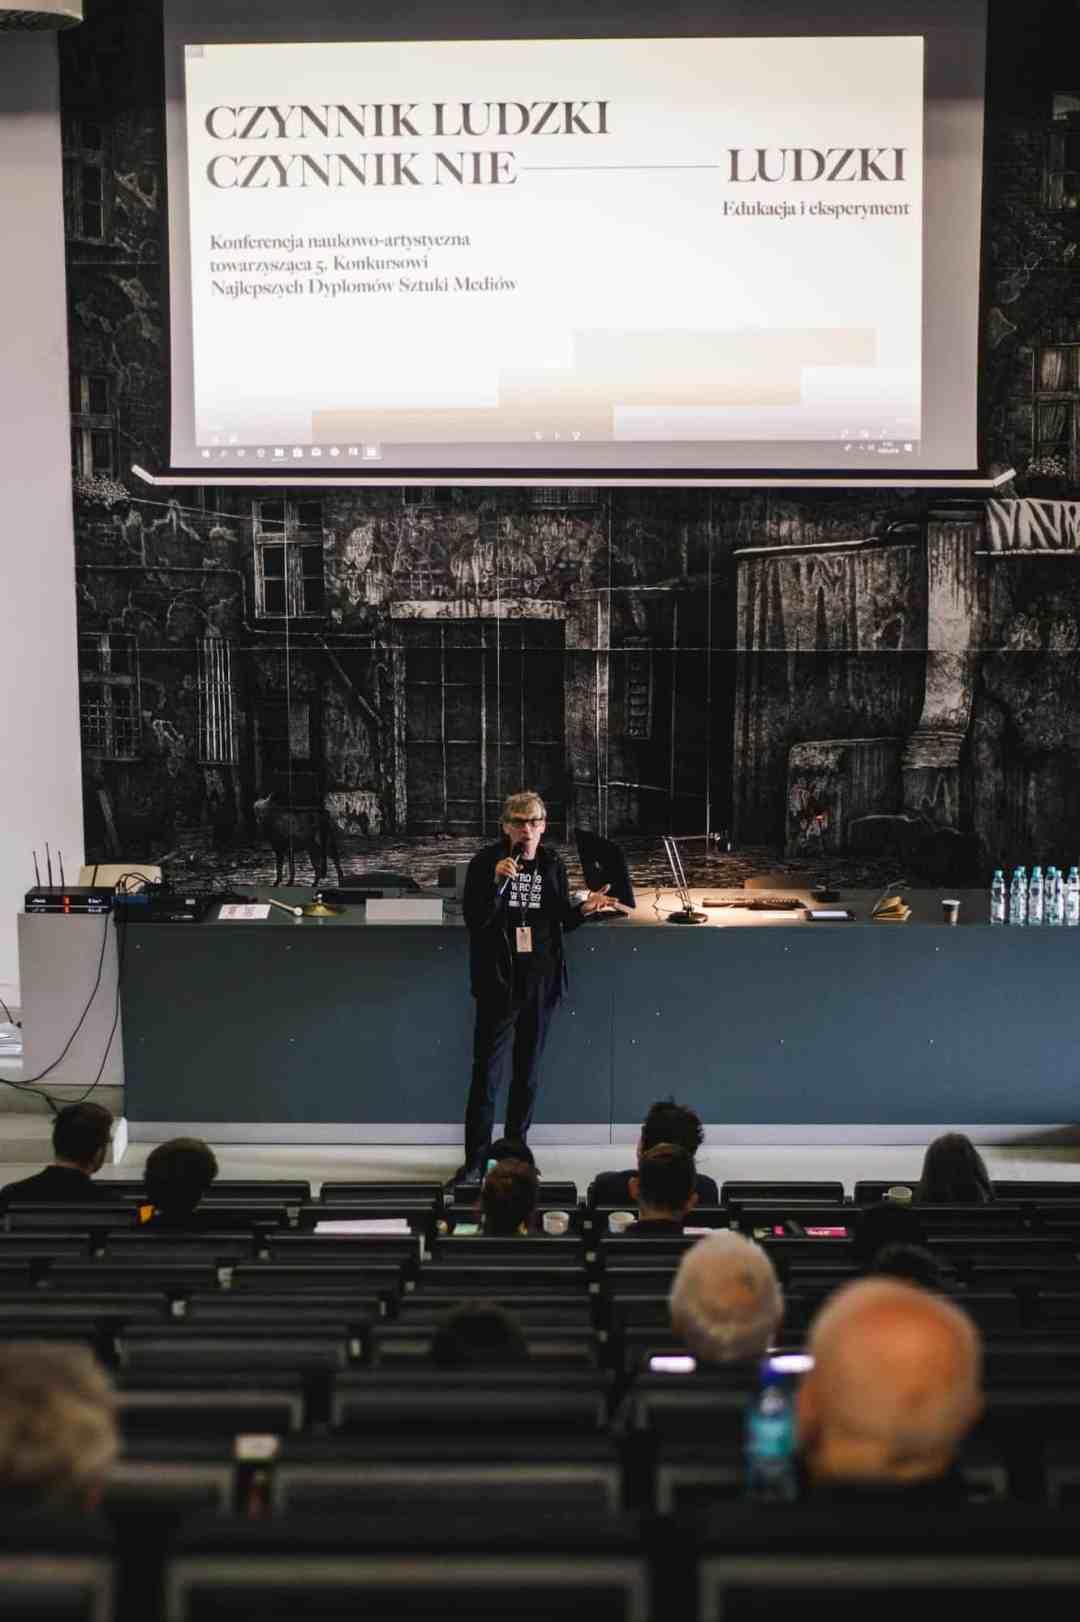 Wro Biennale 2019 , opening event, photo: Wojciech Chrubasik